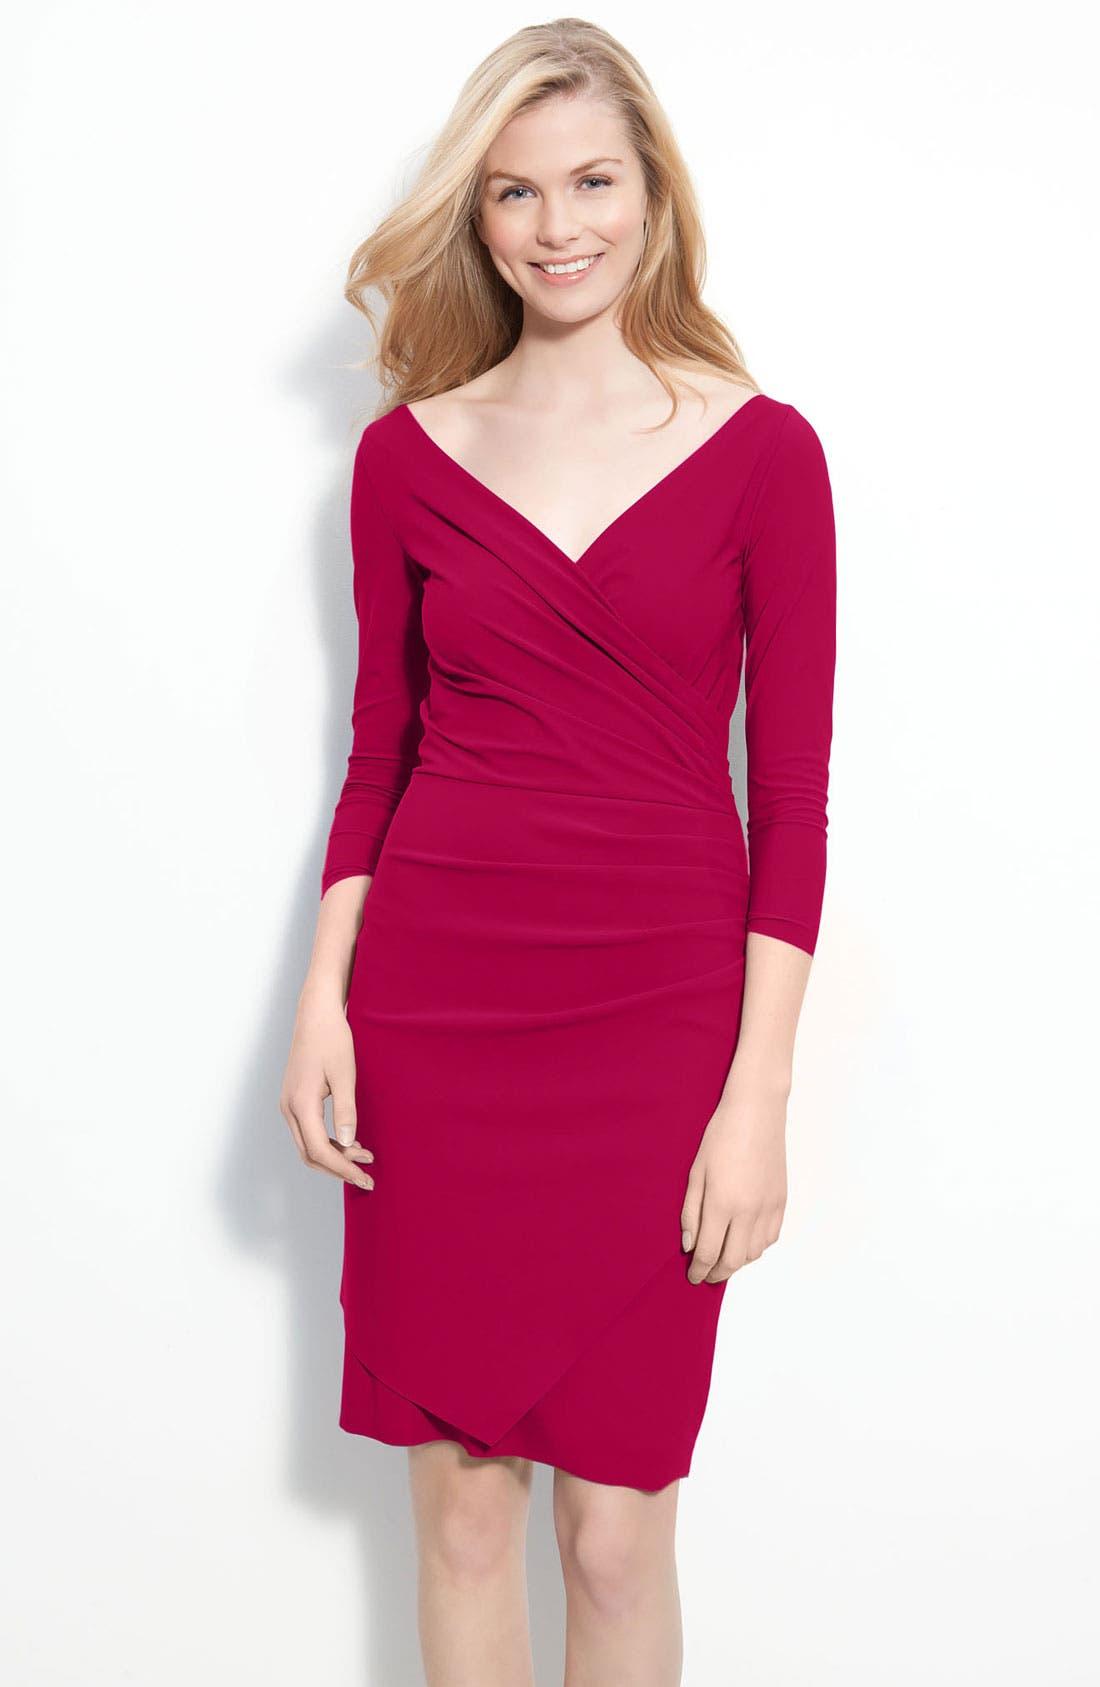 Alternate Image 1 Selected - La Petite Robe by Chiara Boni 'Calantine' Dress